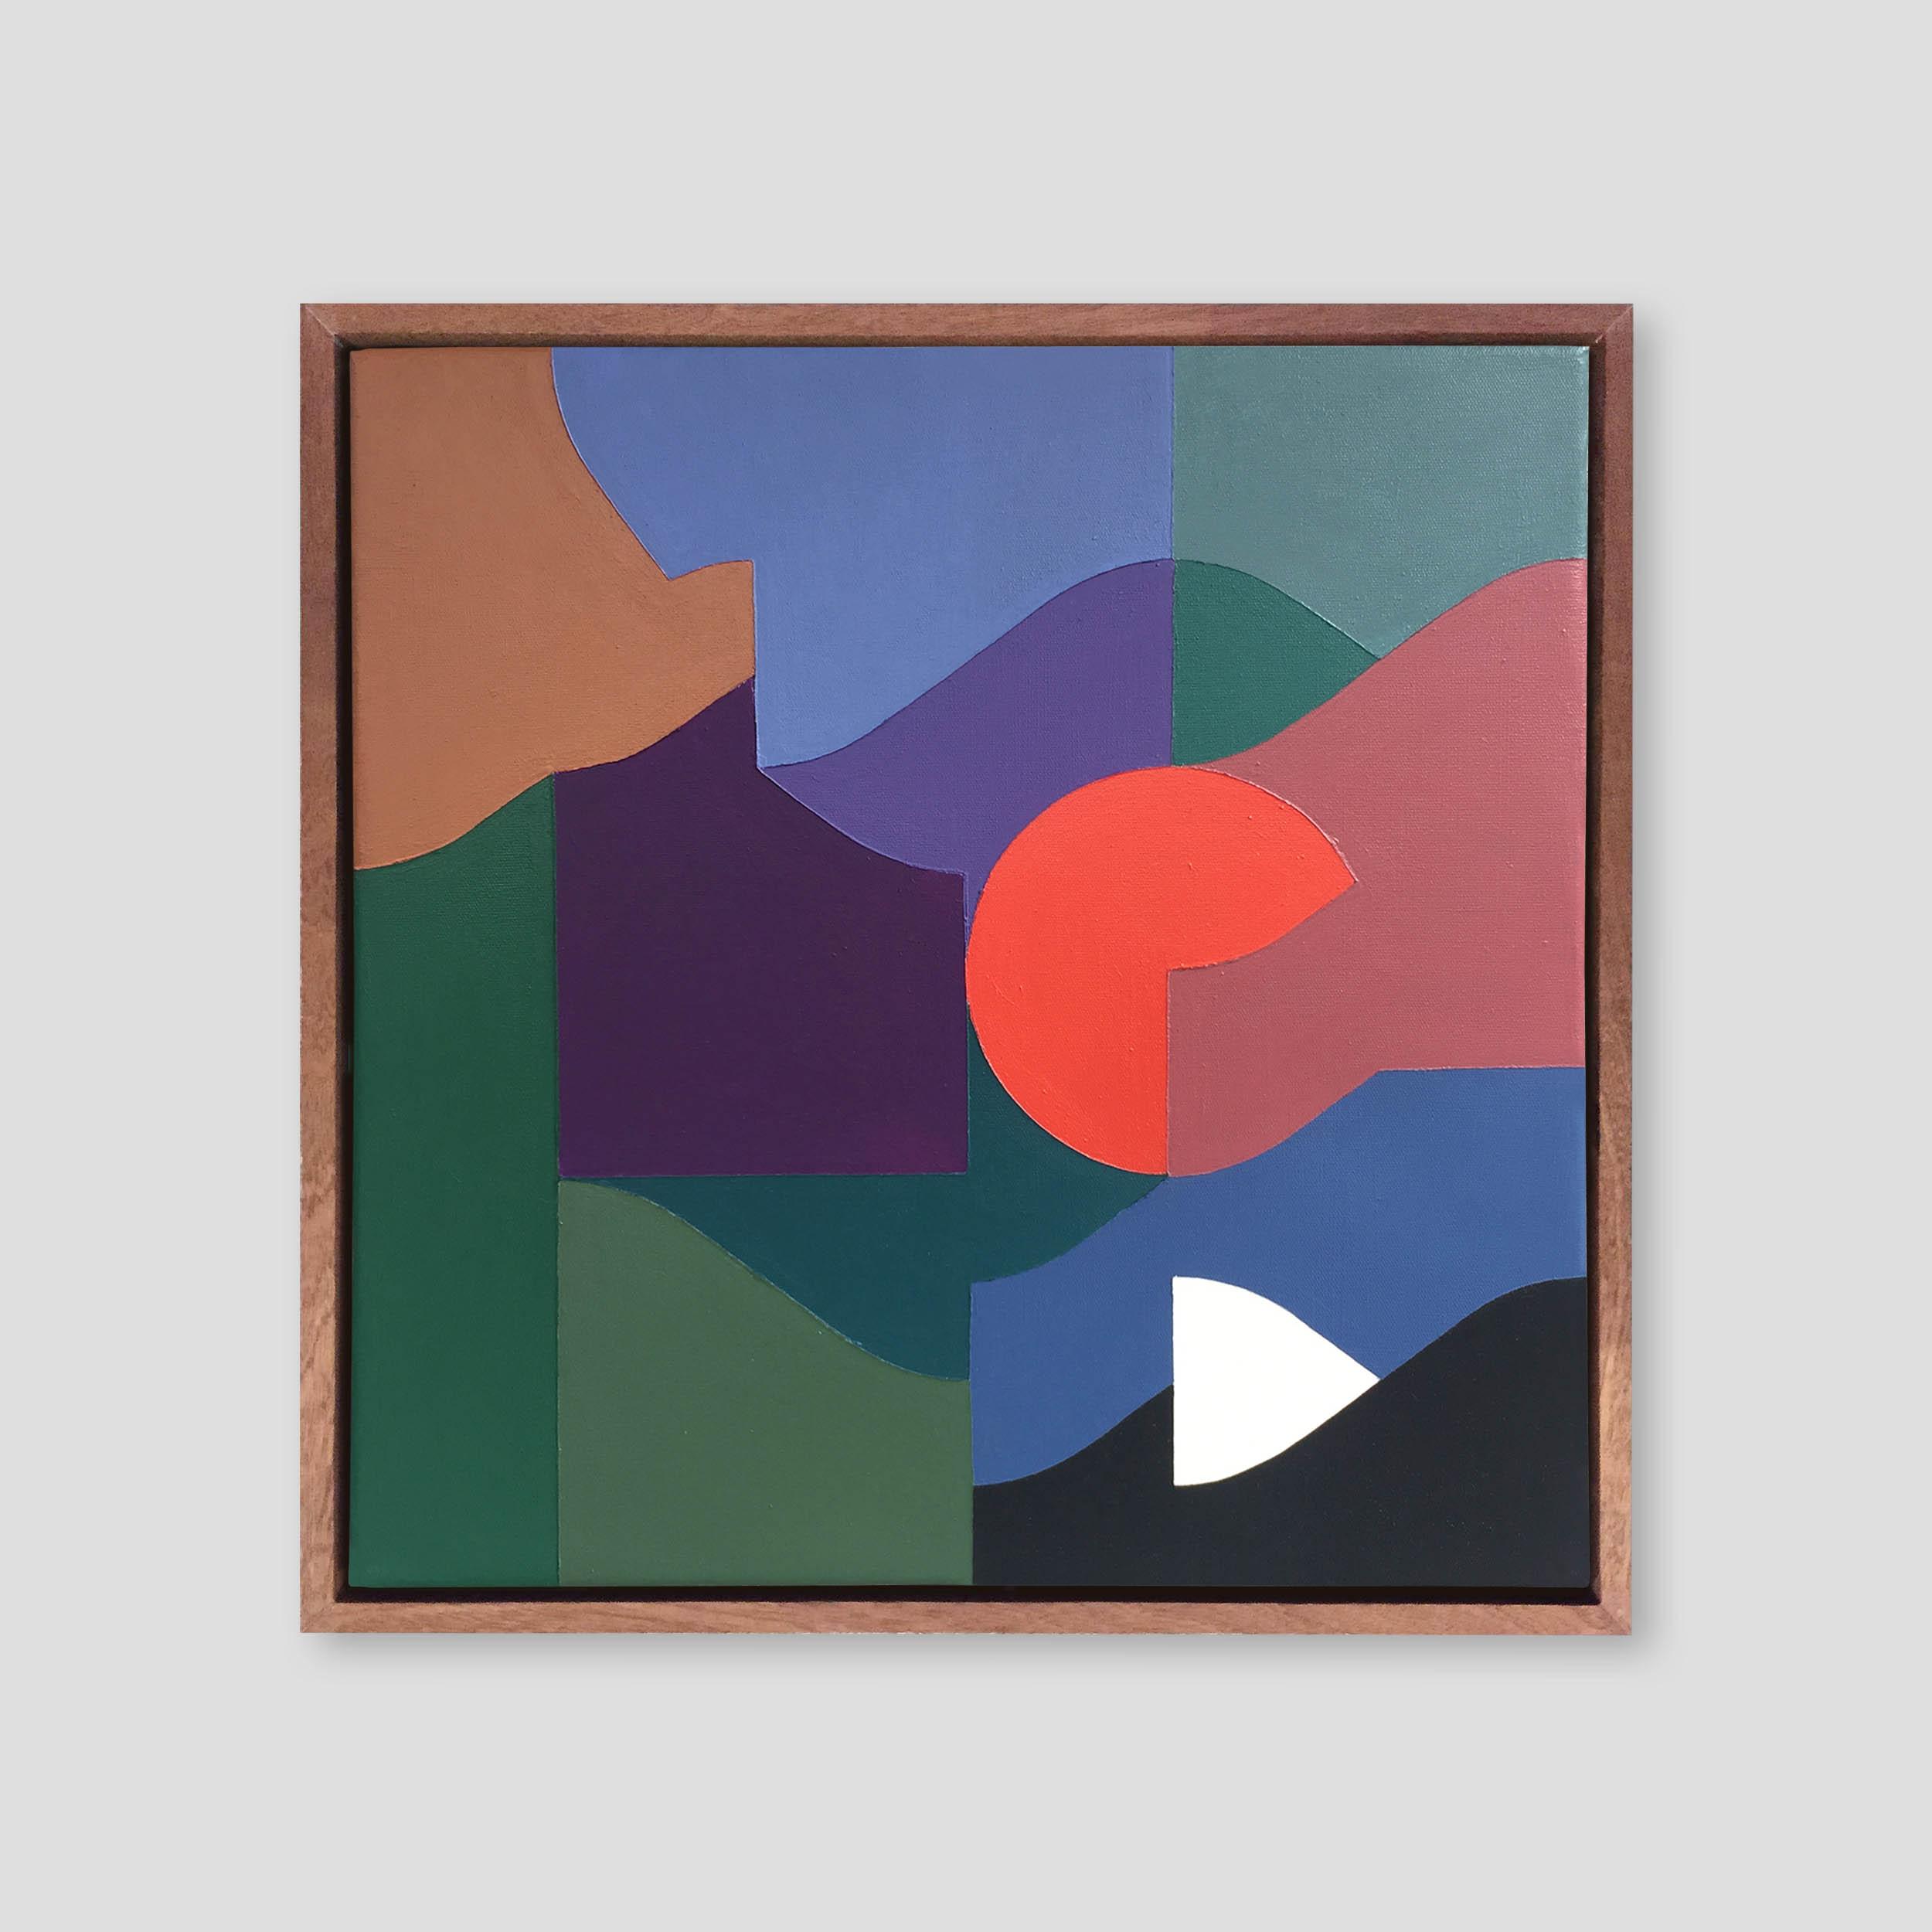 Square Composition No. 12  40 x 40 cm | acrylic on canvas, sapele frame | 2018